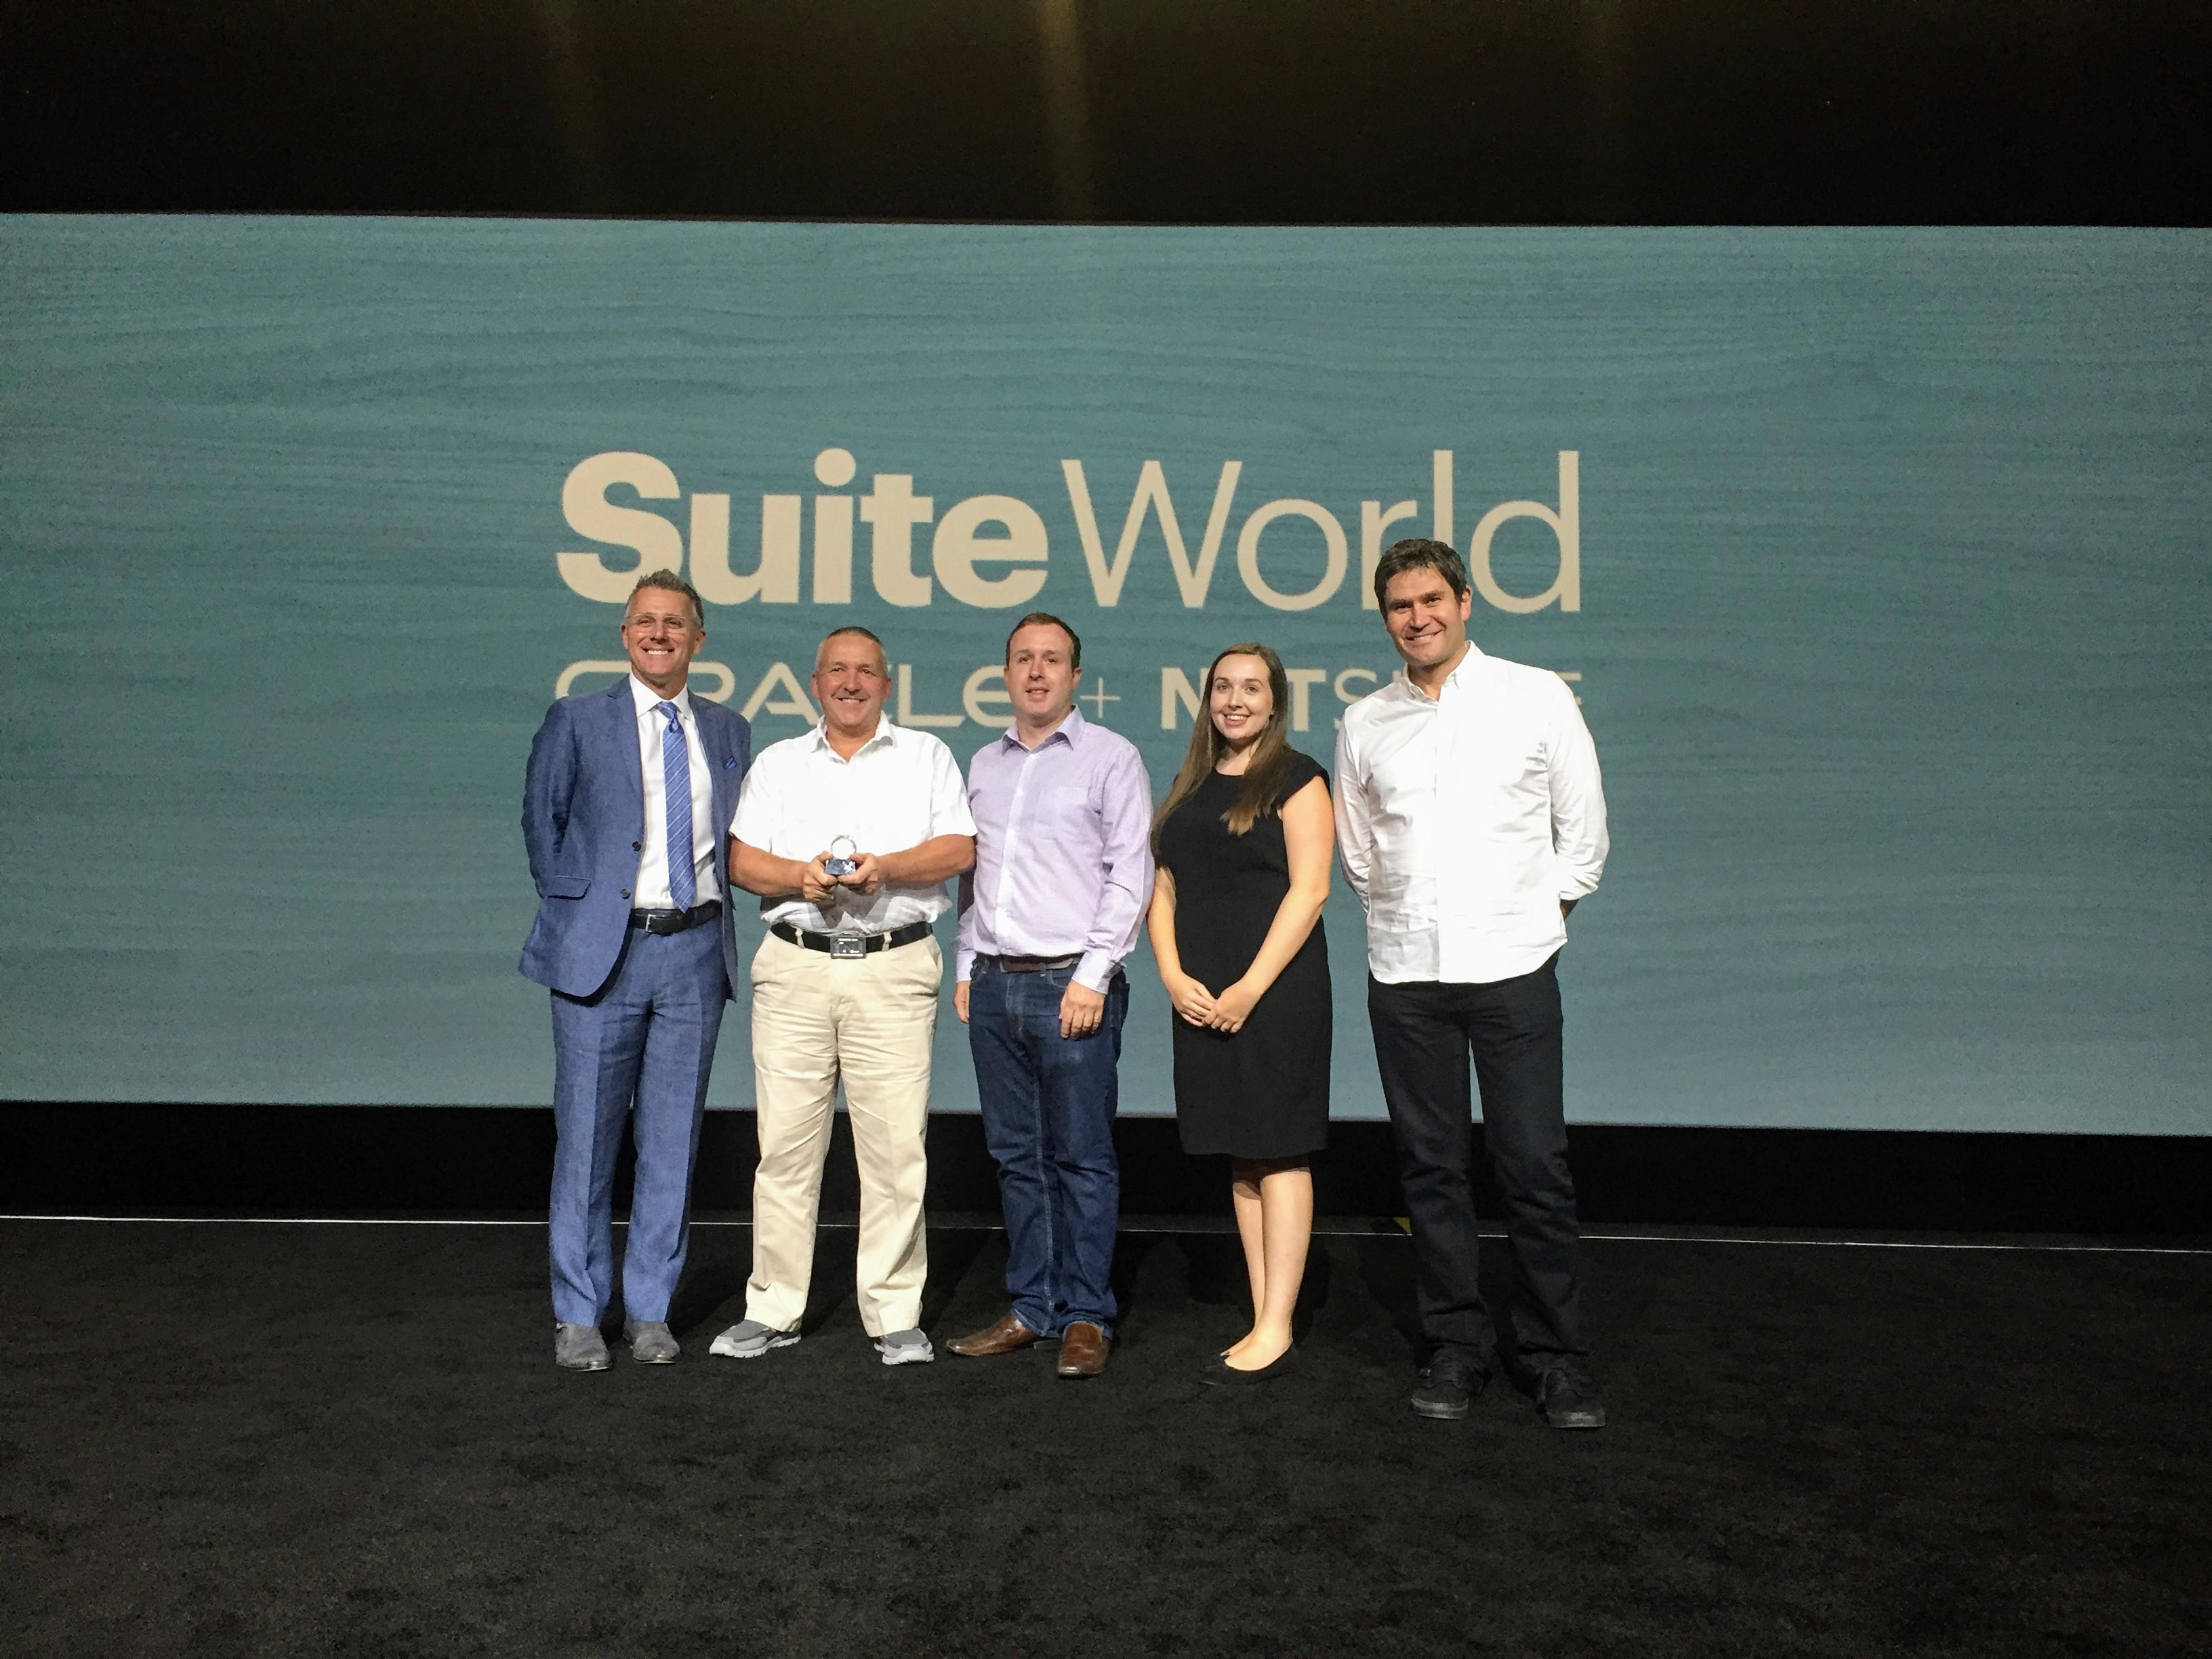 FHL receiving NetSuite EMEA partner of Year Award 2017